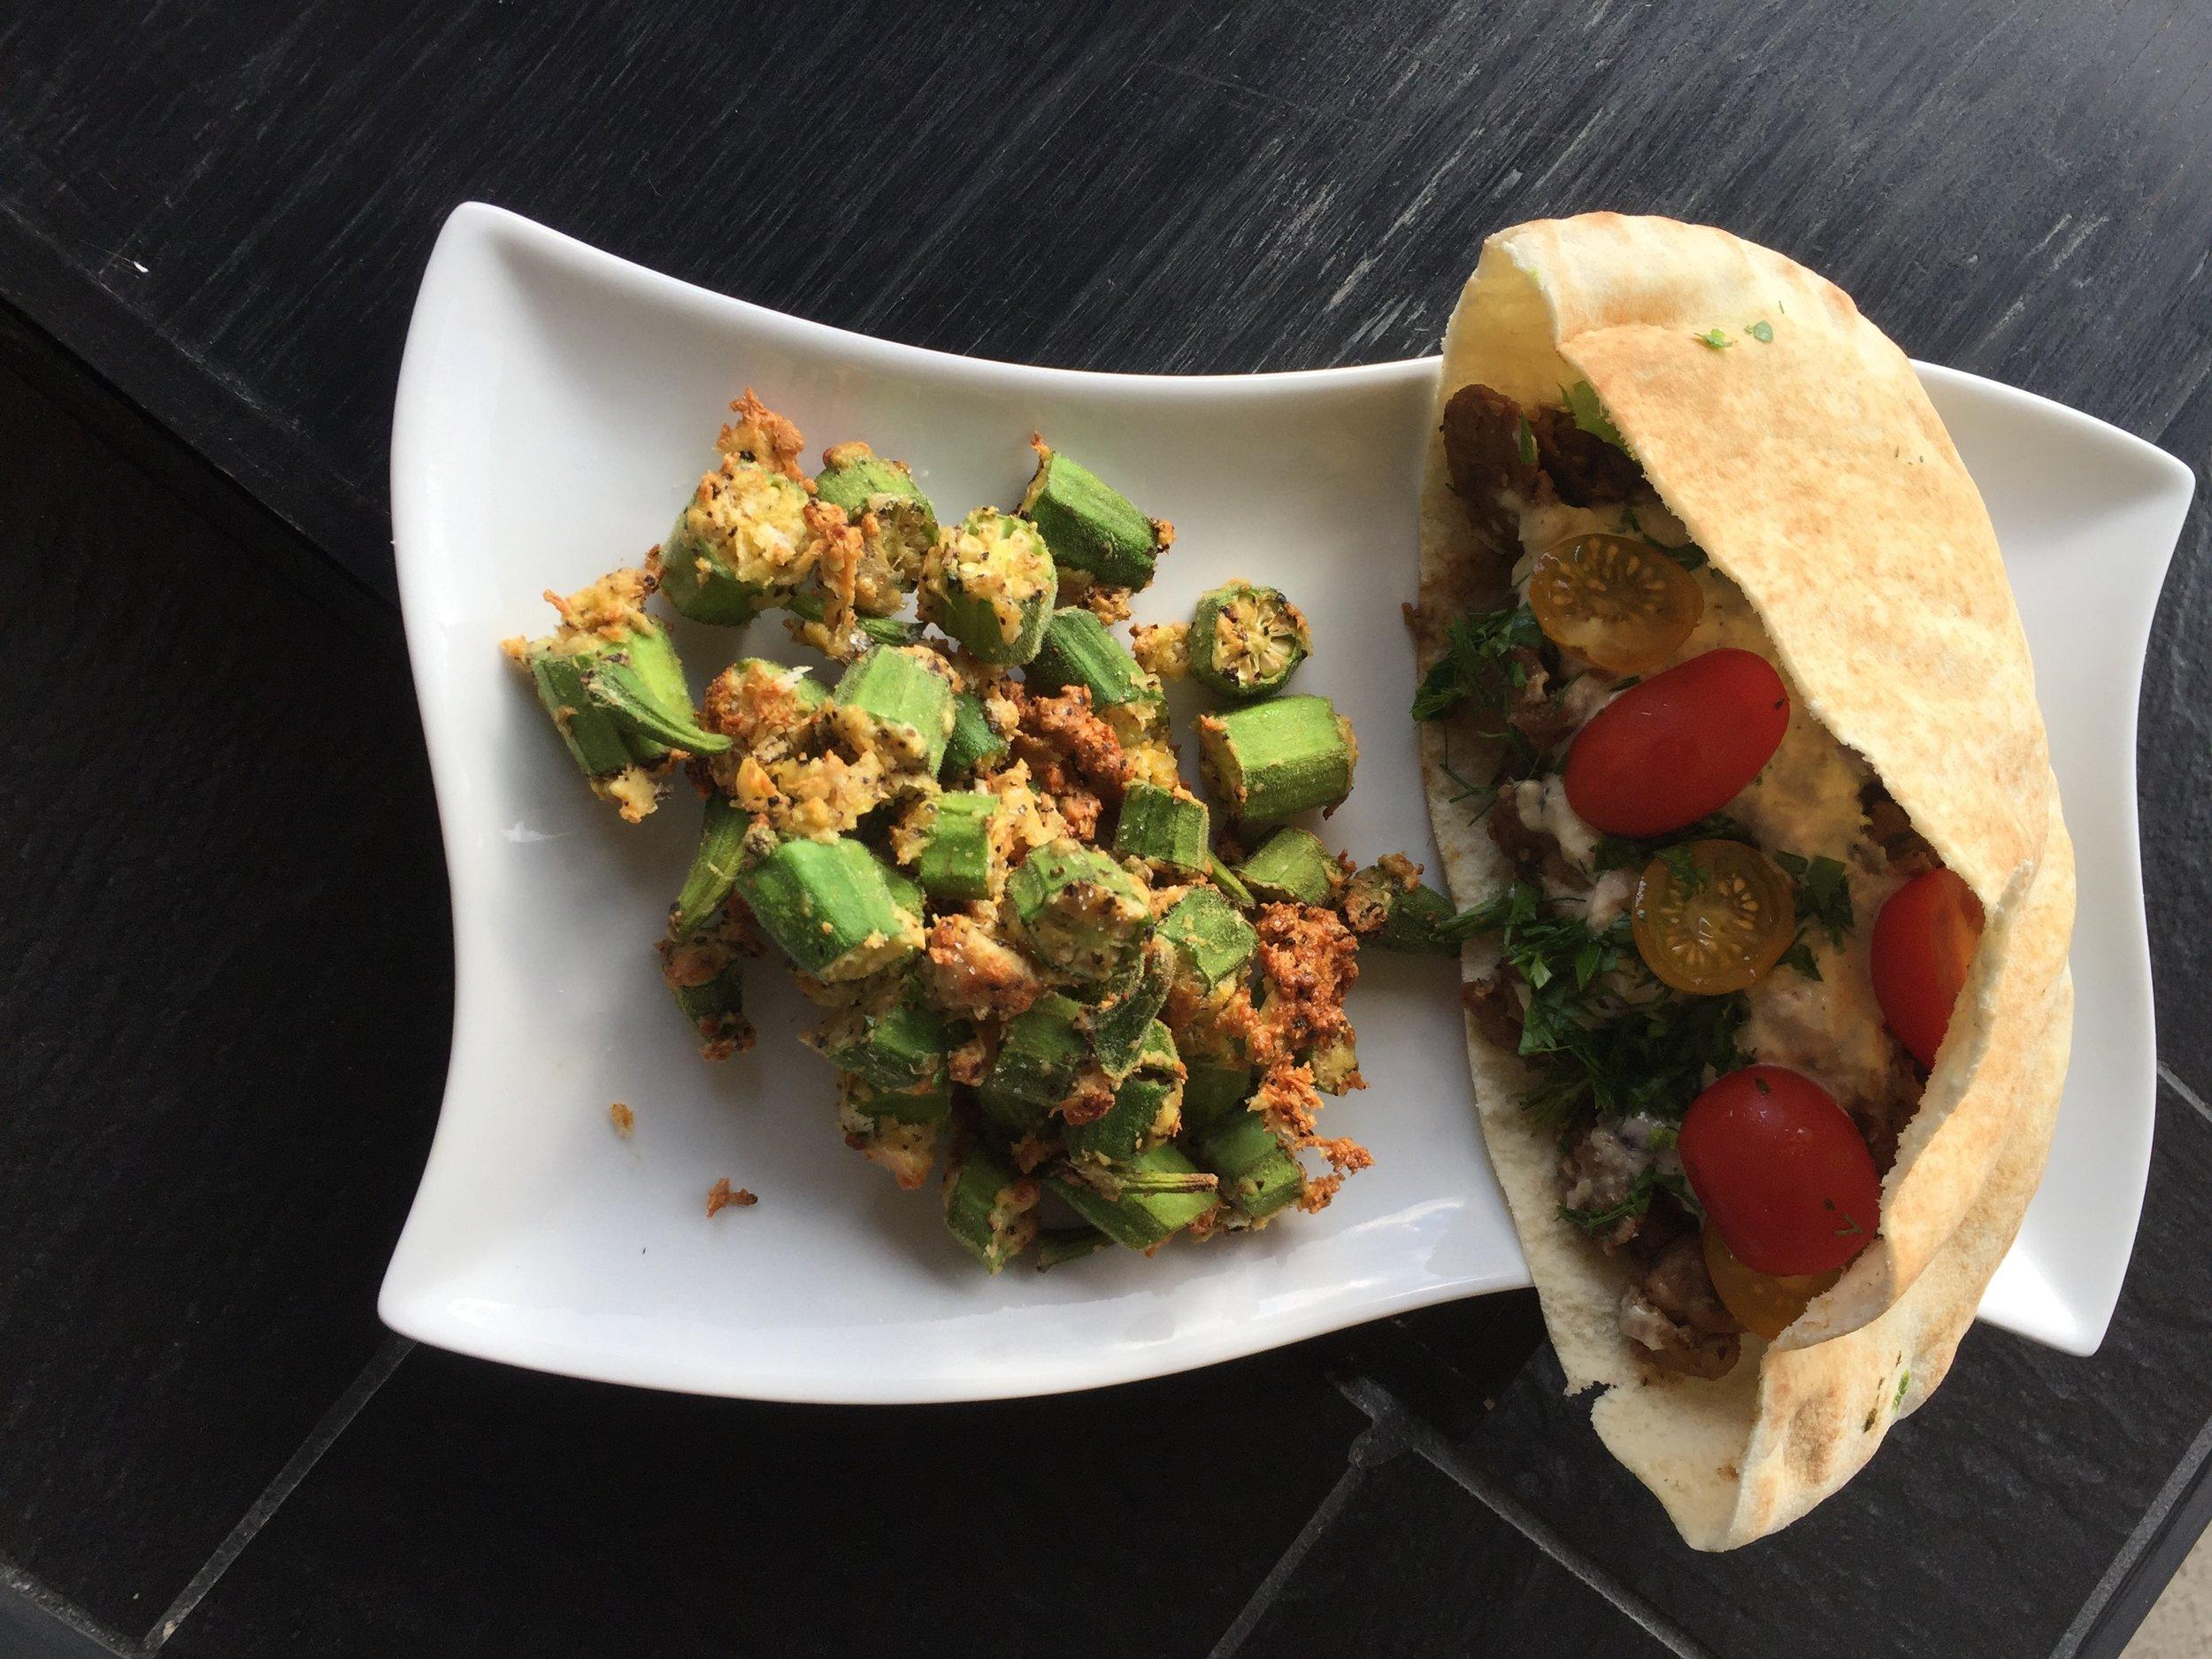 Air Fried Okra and Vegan Gyros